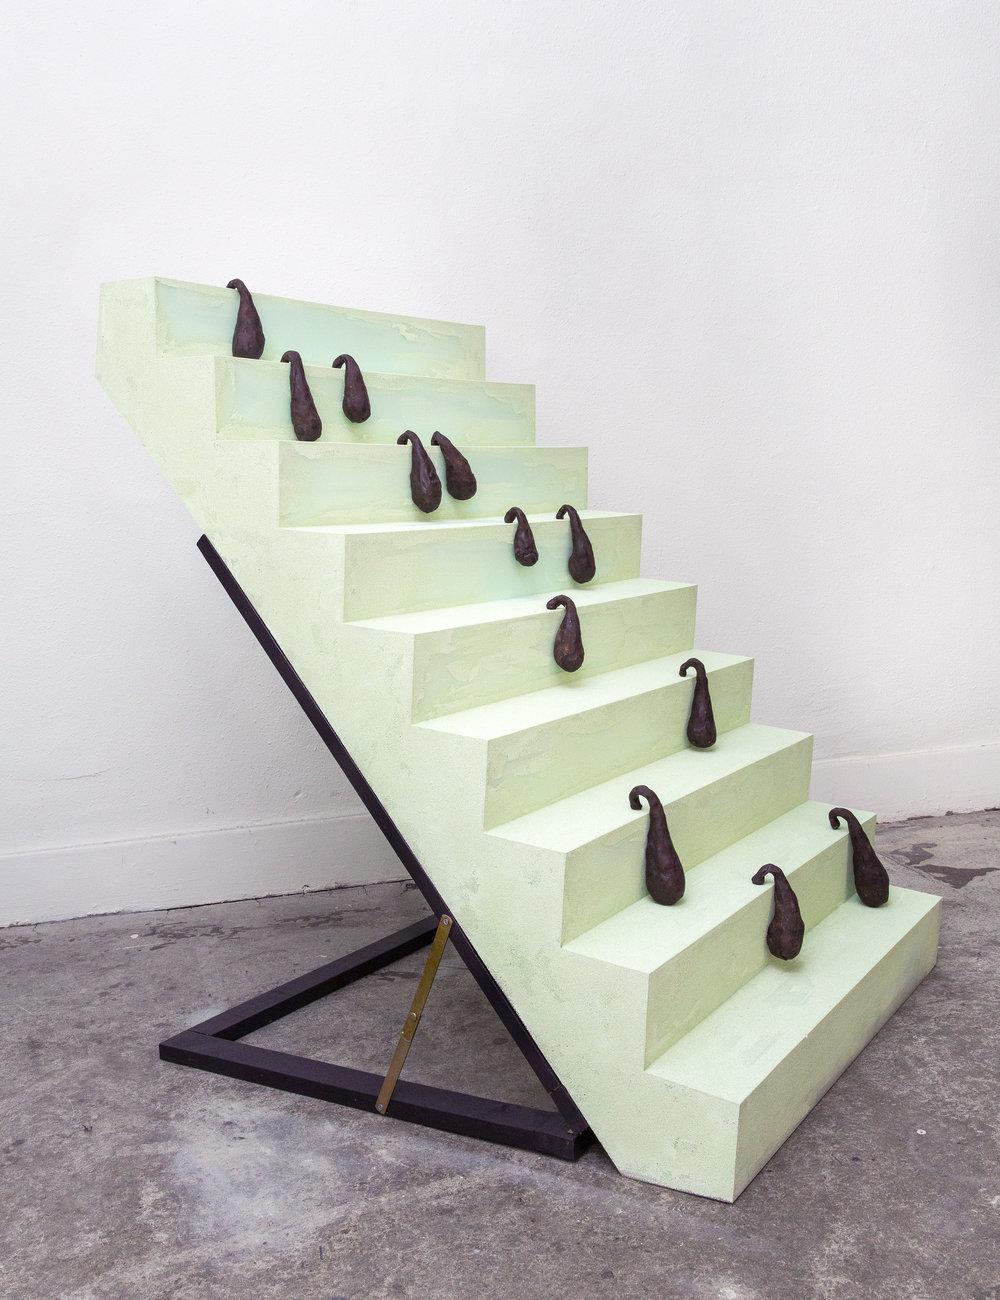 Drops Climbing a Staircase of Foam, 2014 Bemalter Schaumstoff, Keramik ca. 120 x 100 x 70